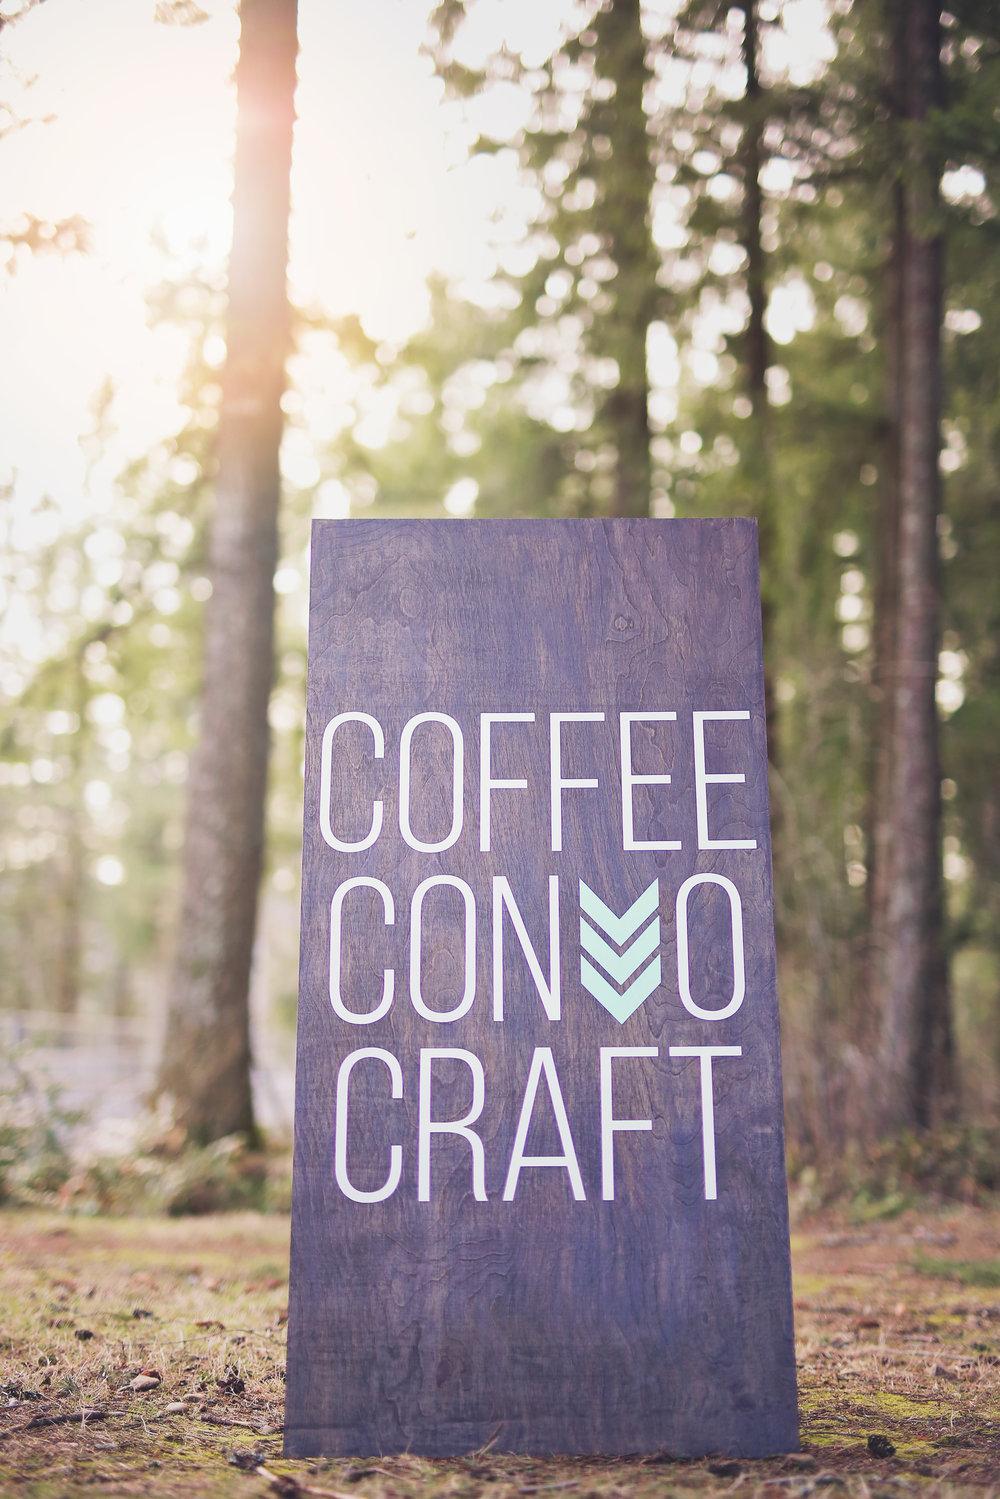 Coffee Convo Craft at New Community Church - 11.1.18 | 6:30pmNew Community Church21401 244th Ave SEMaple Valley, WA 98038